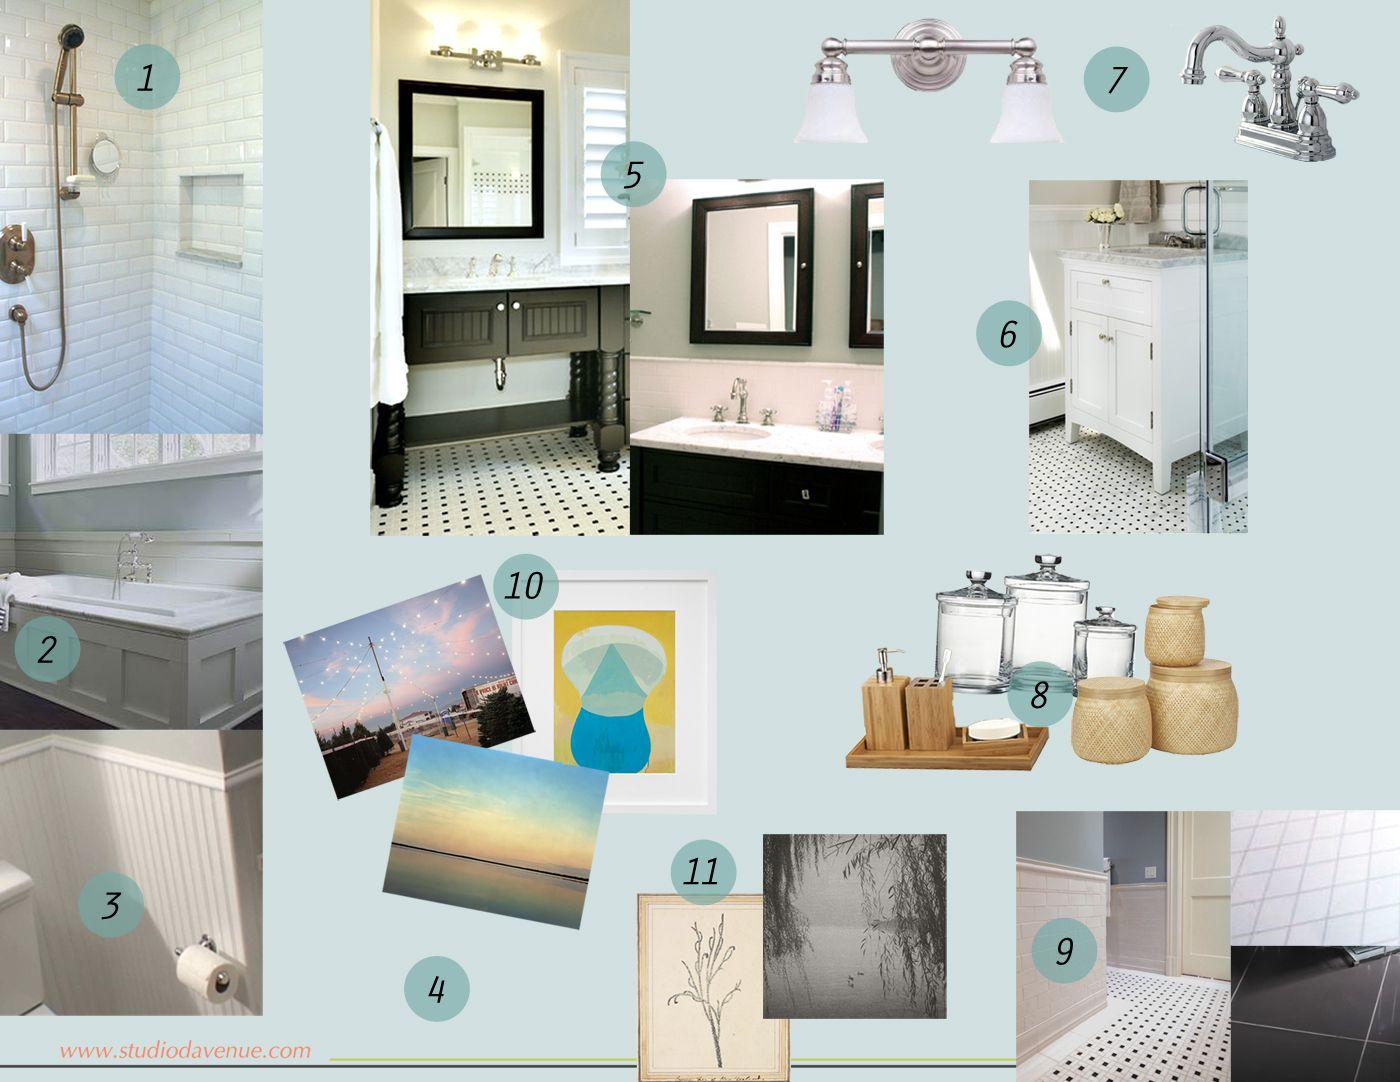 Mood board bathroom update design studio davenue for Bathroom design board